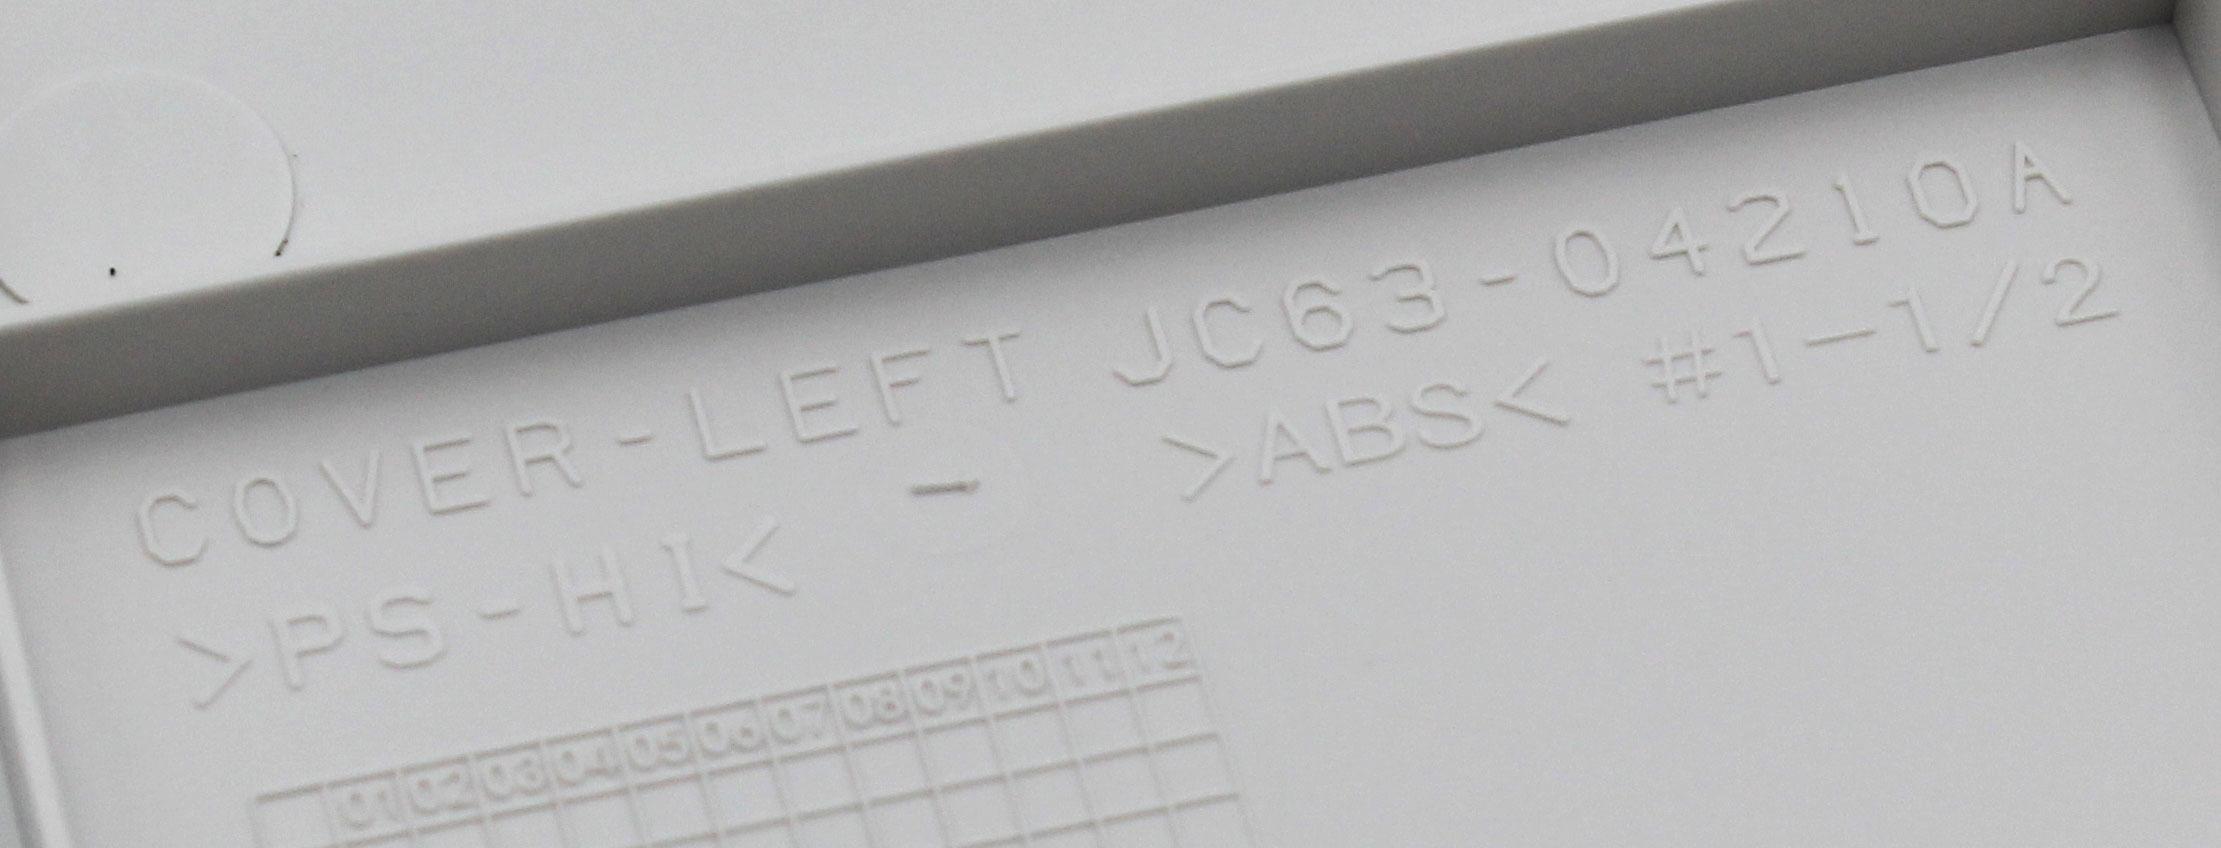 002N03167 Левая крышка Xerox Phaser 3052/3260 WC 3215/3225 - 2